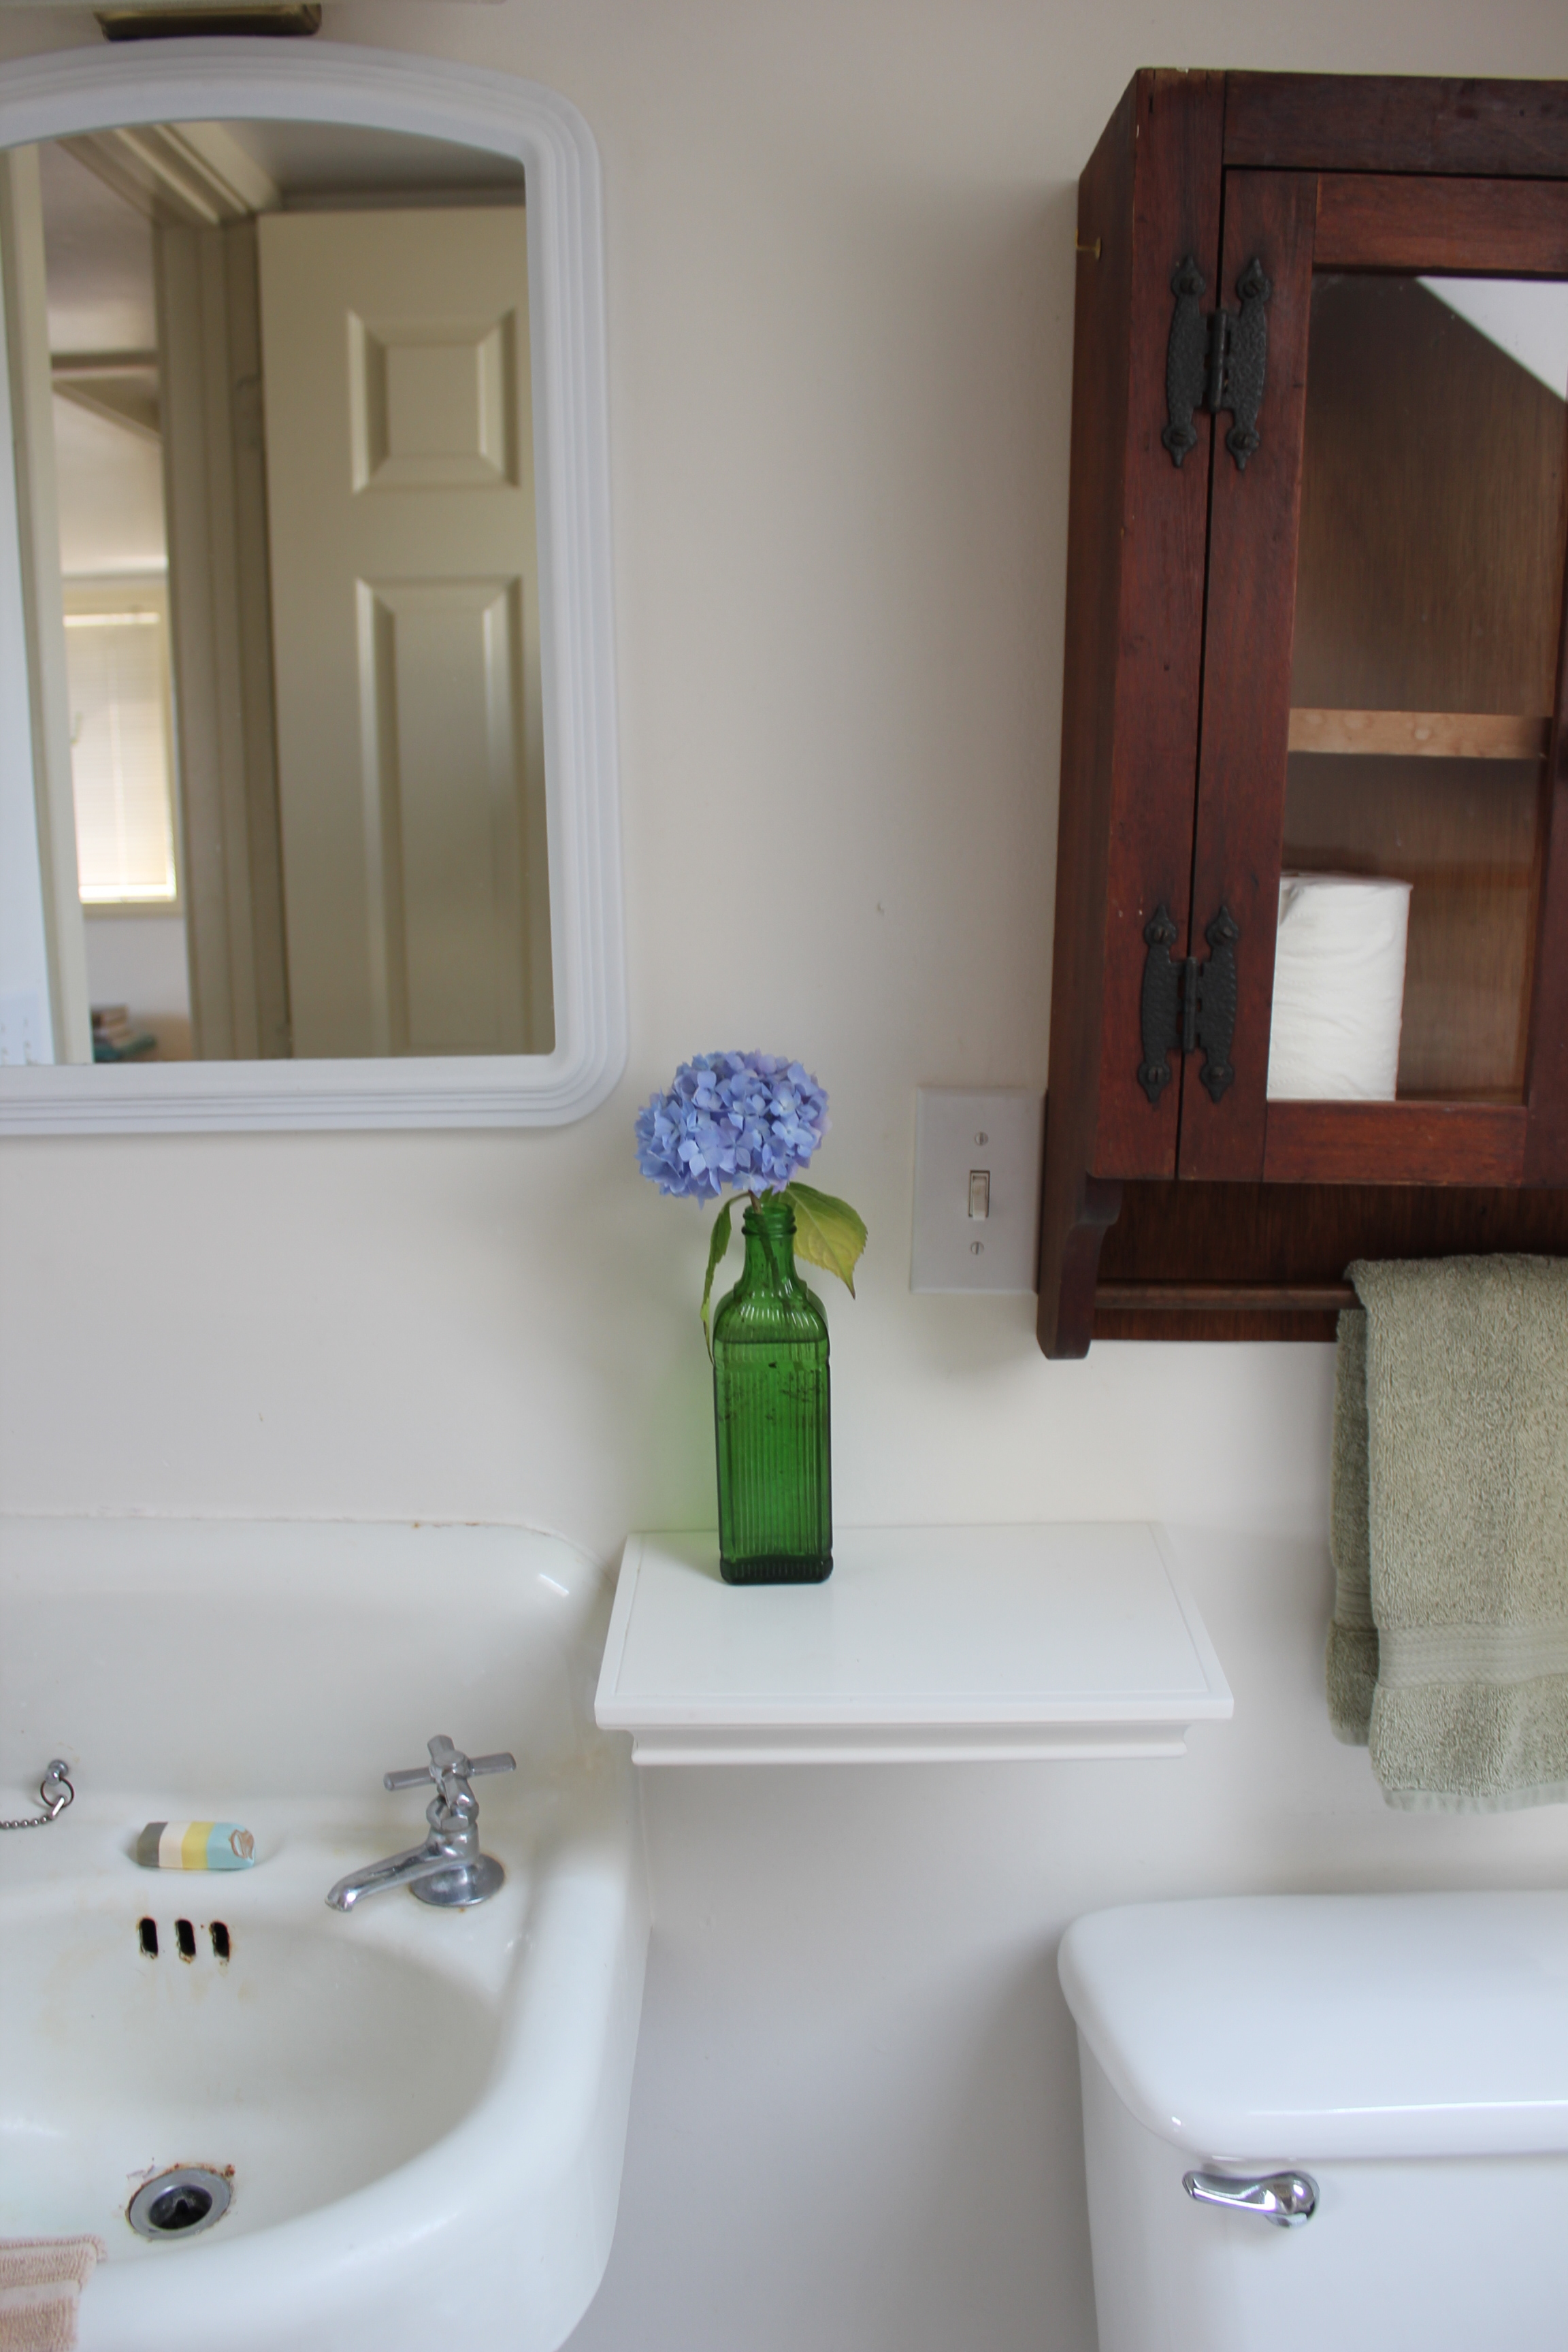 bathroom hydranga and vintage vase at plum nelli farm chic home rental.JPG